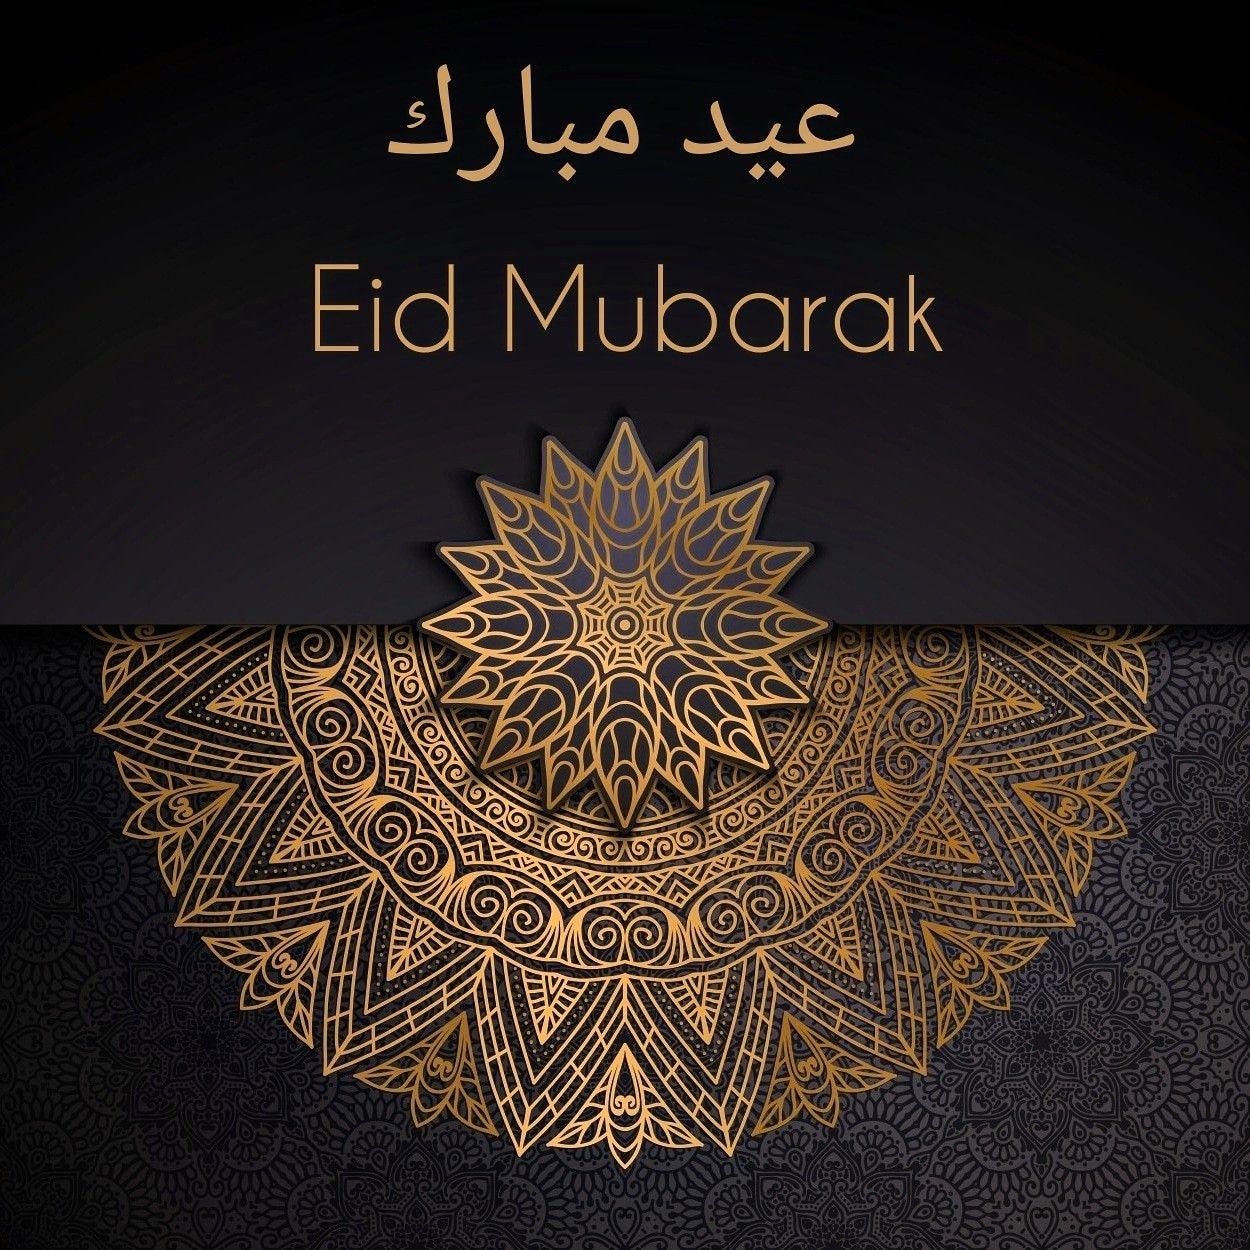 Eid Mubarak Everyone عيد مبارك للجميع Eid Ul Fitr Eid Mubarak Eid Al Fitr